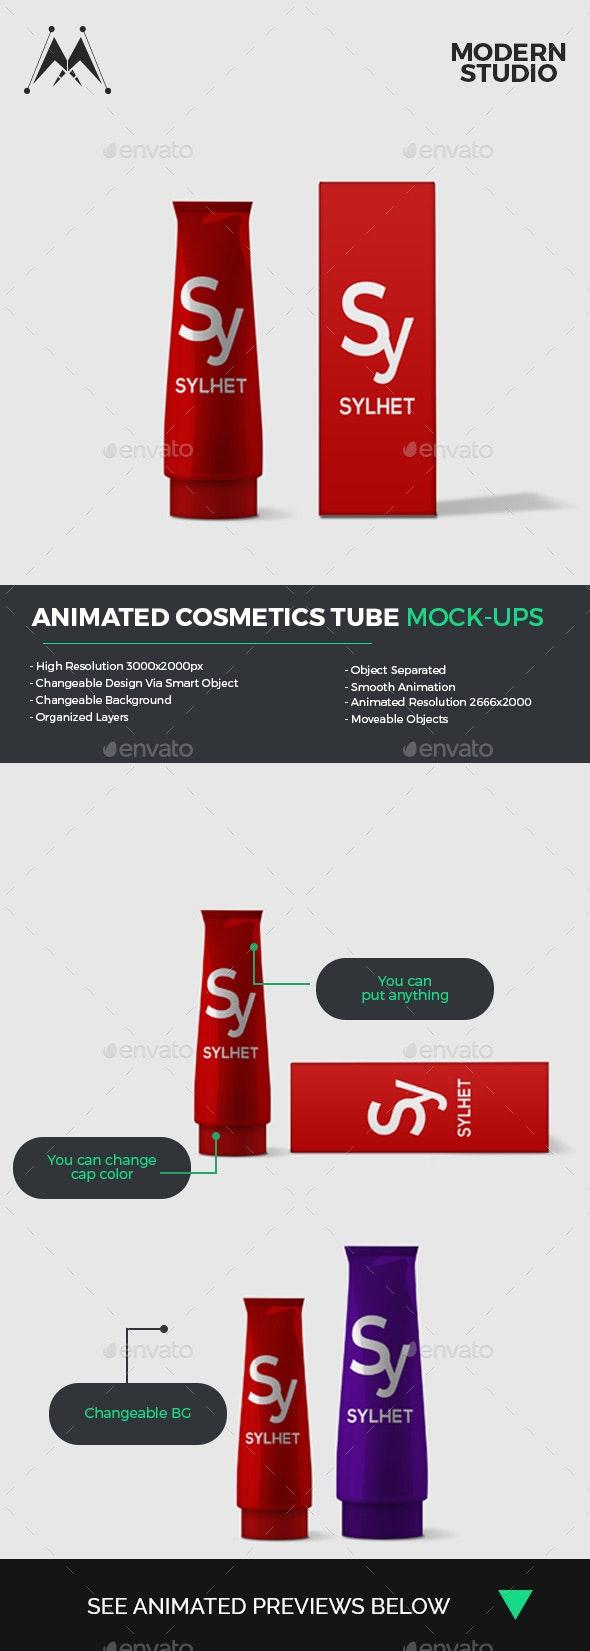 Animated Cosmetics Tube Mock-Ups - Beauty Packaging